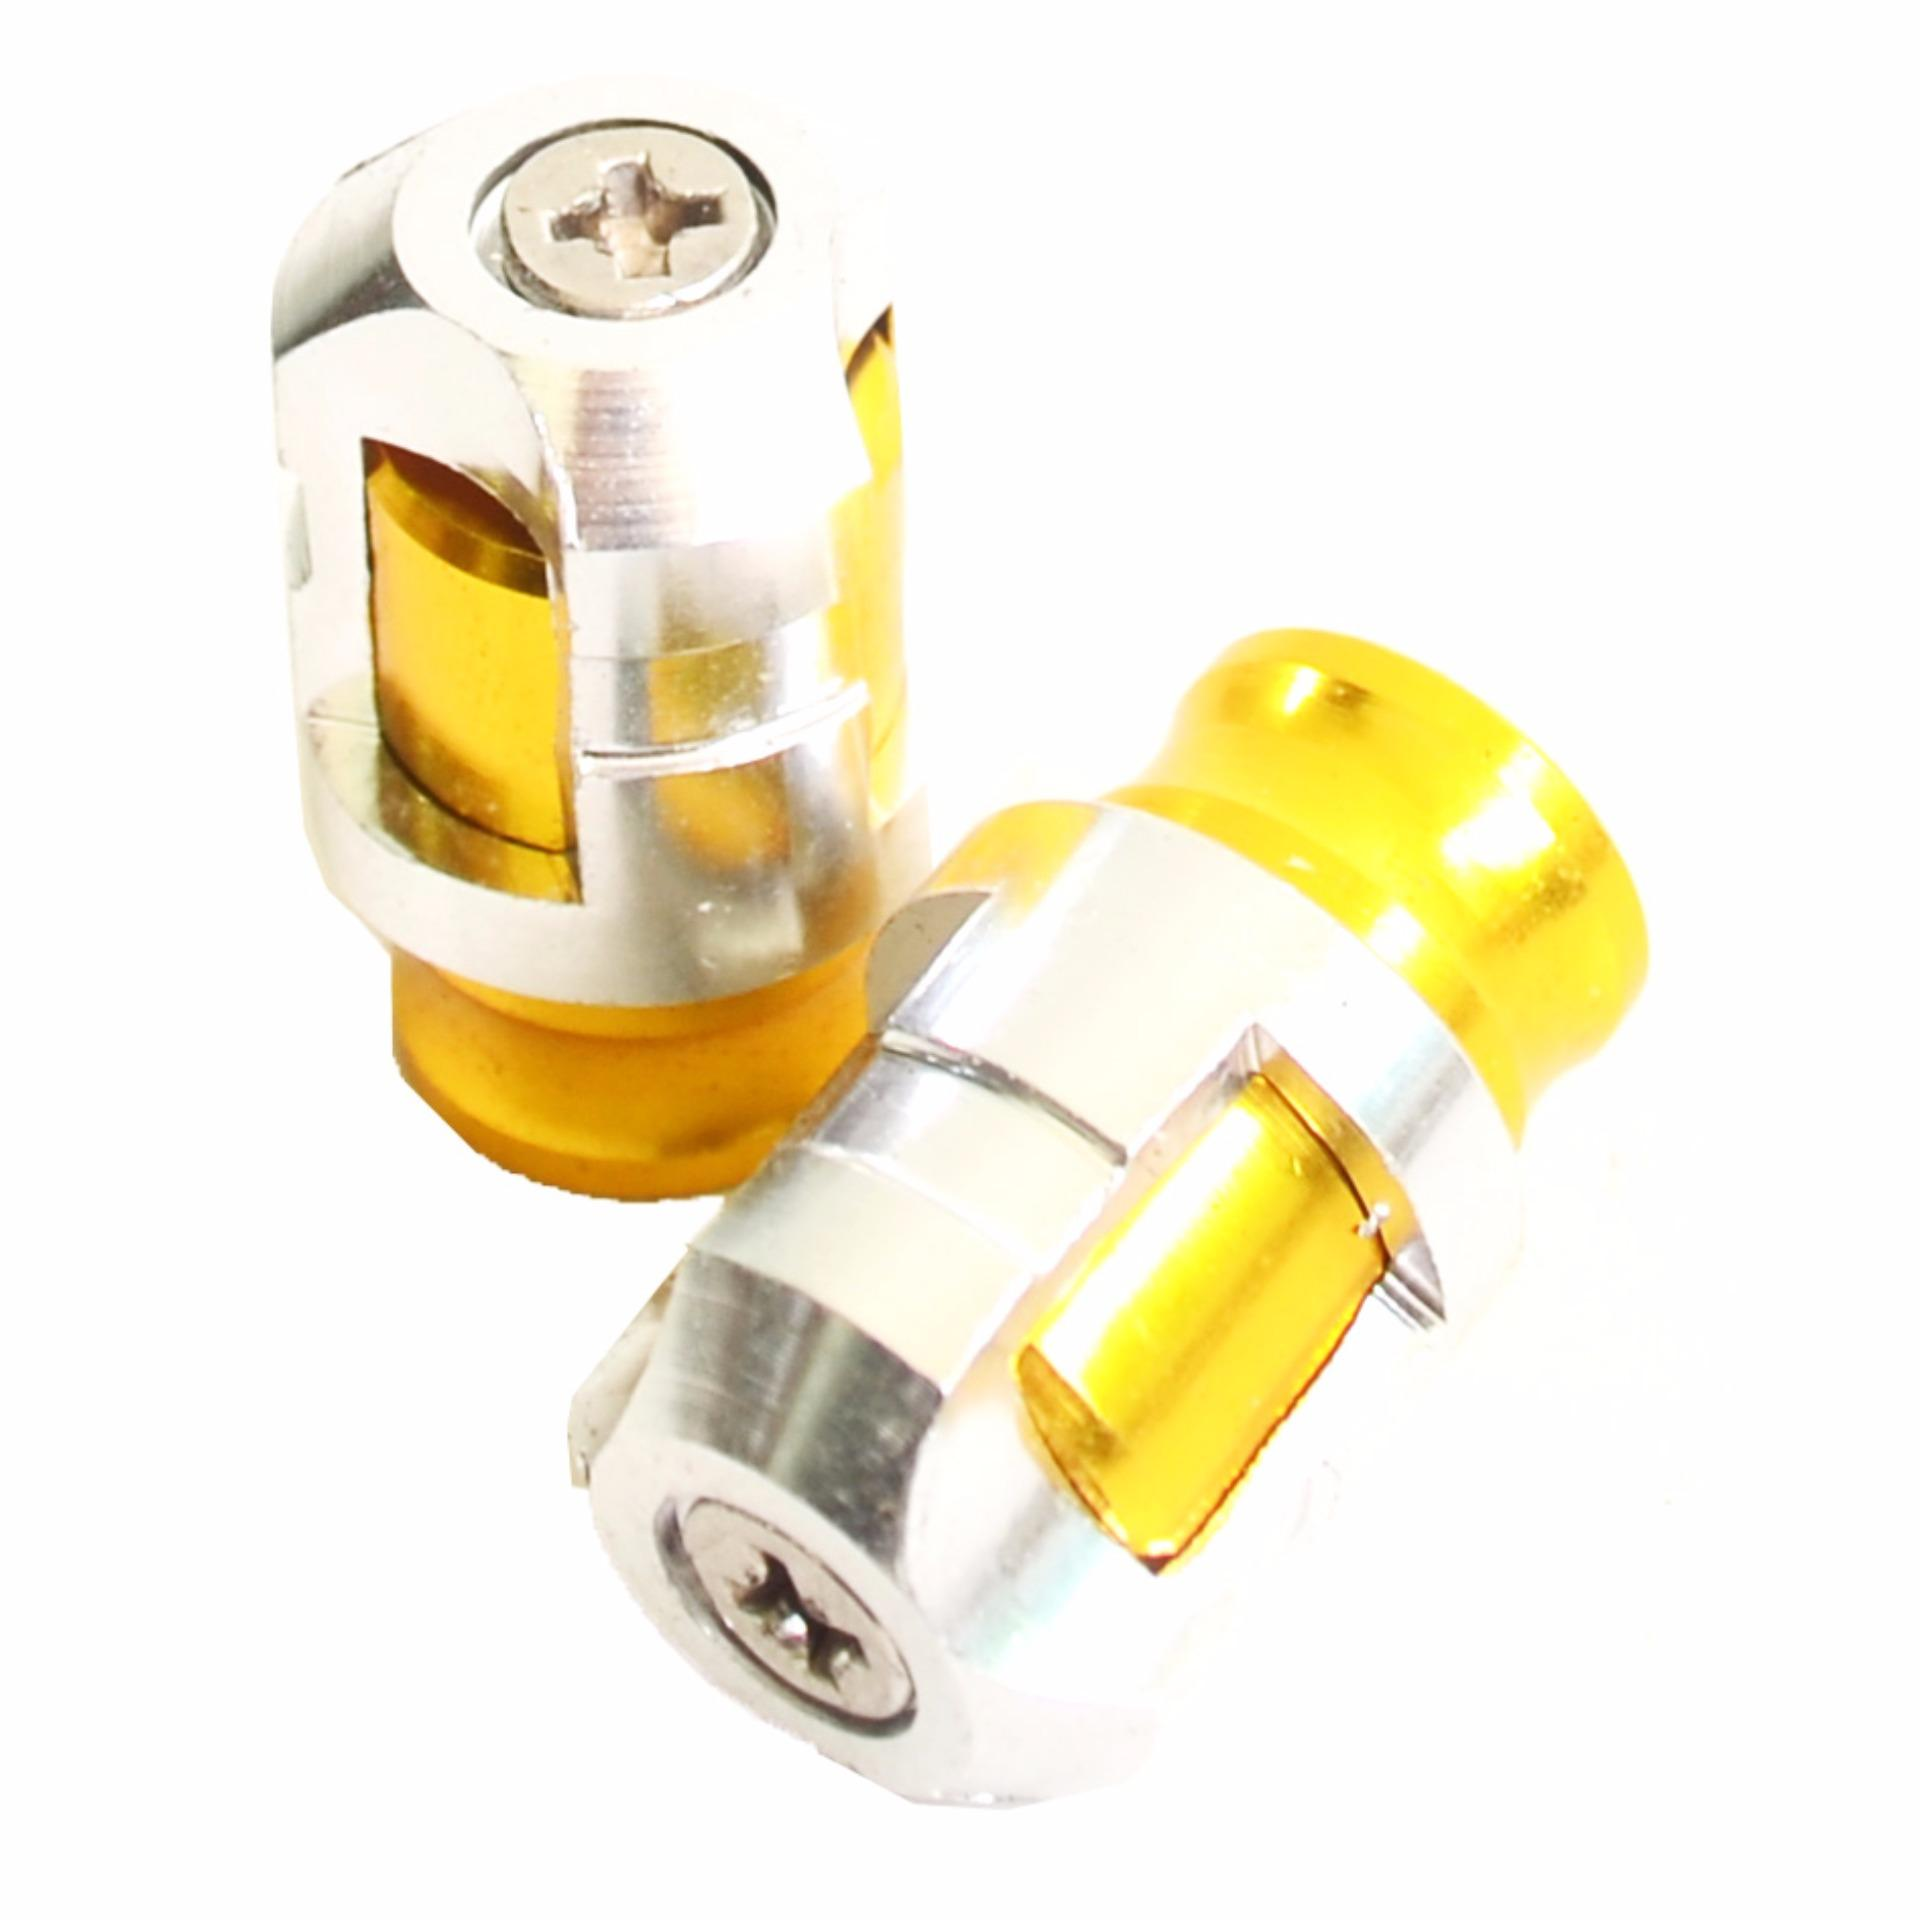 Rajamotor Tutup Pentil Segi Enam Pendek Besi Chrom 2 Set Daftar Hijau Nitrogen 6 Nitex Silver Gold